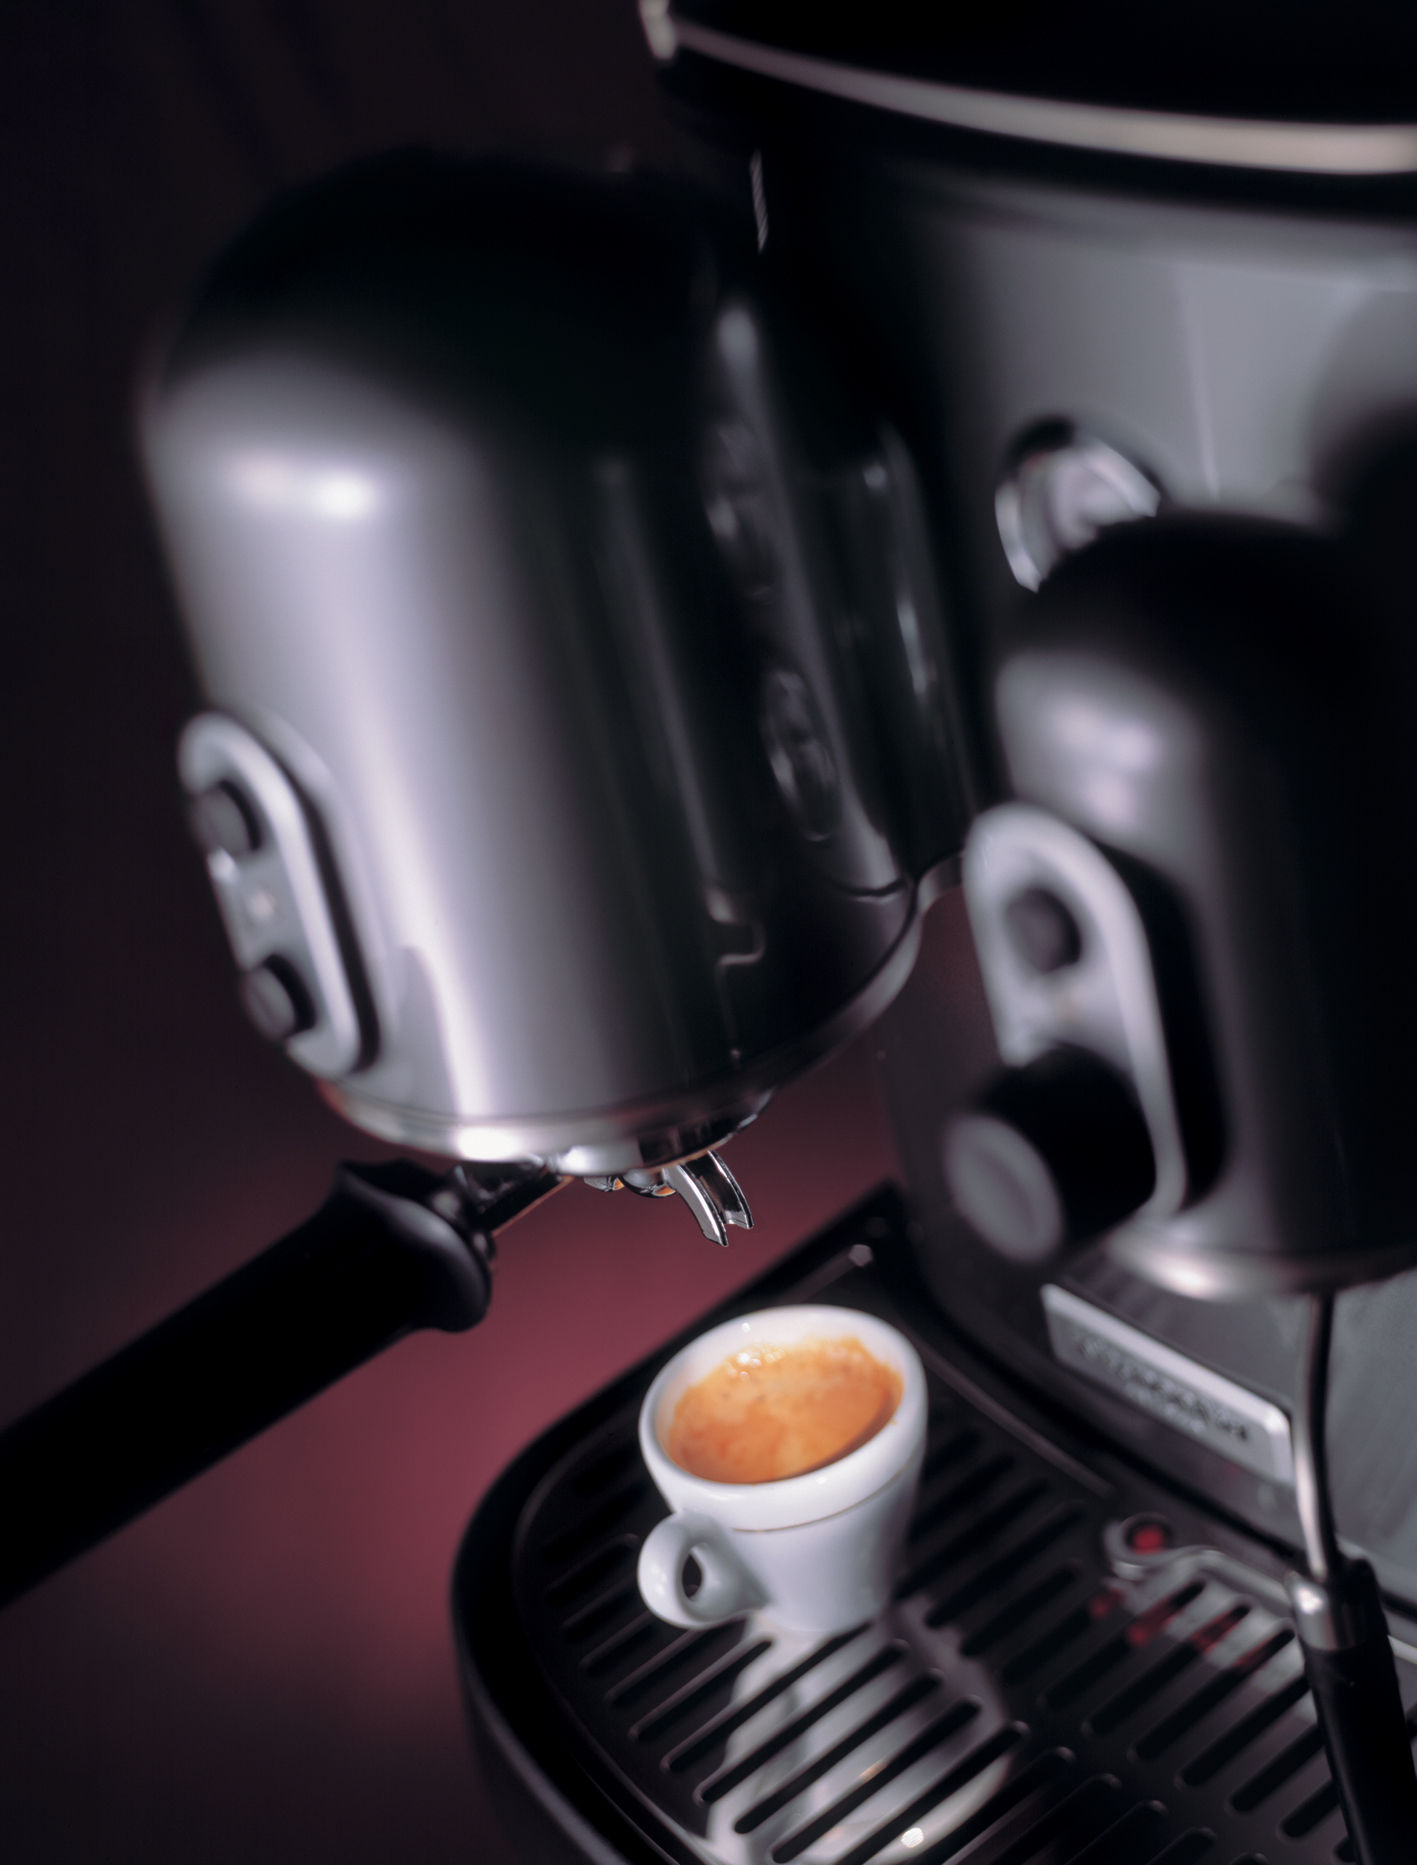 cafeti re expresso artisan pour dosettes et caf moulu noir kitchenaid. Black Bedroom Furniture Sets. Home Design Ideas